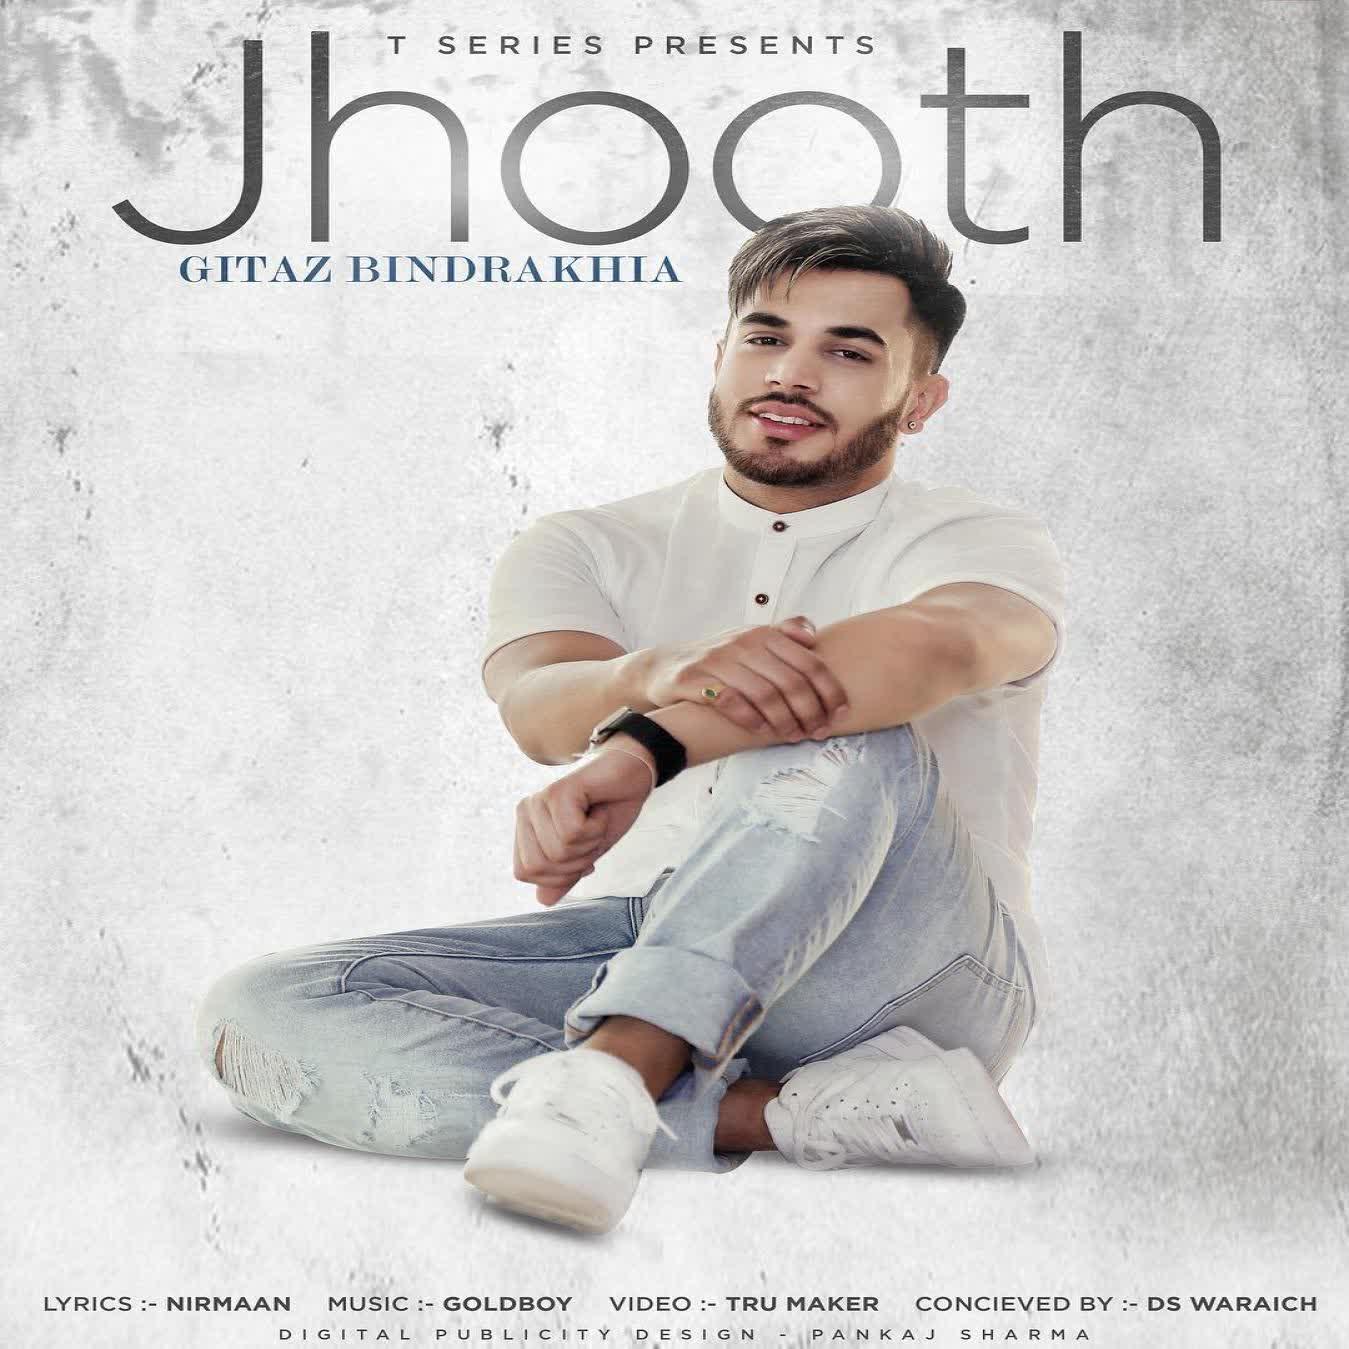 Jhooth Gitaz Bindrakhia